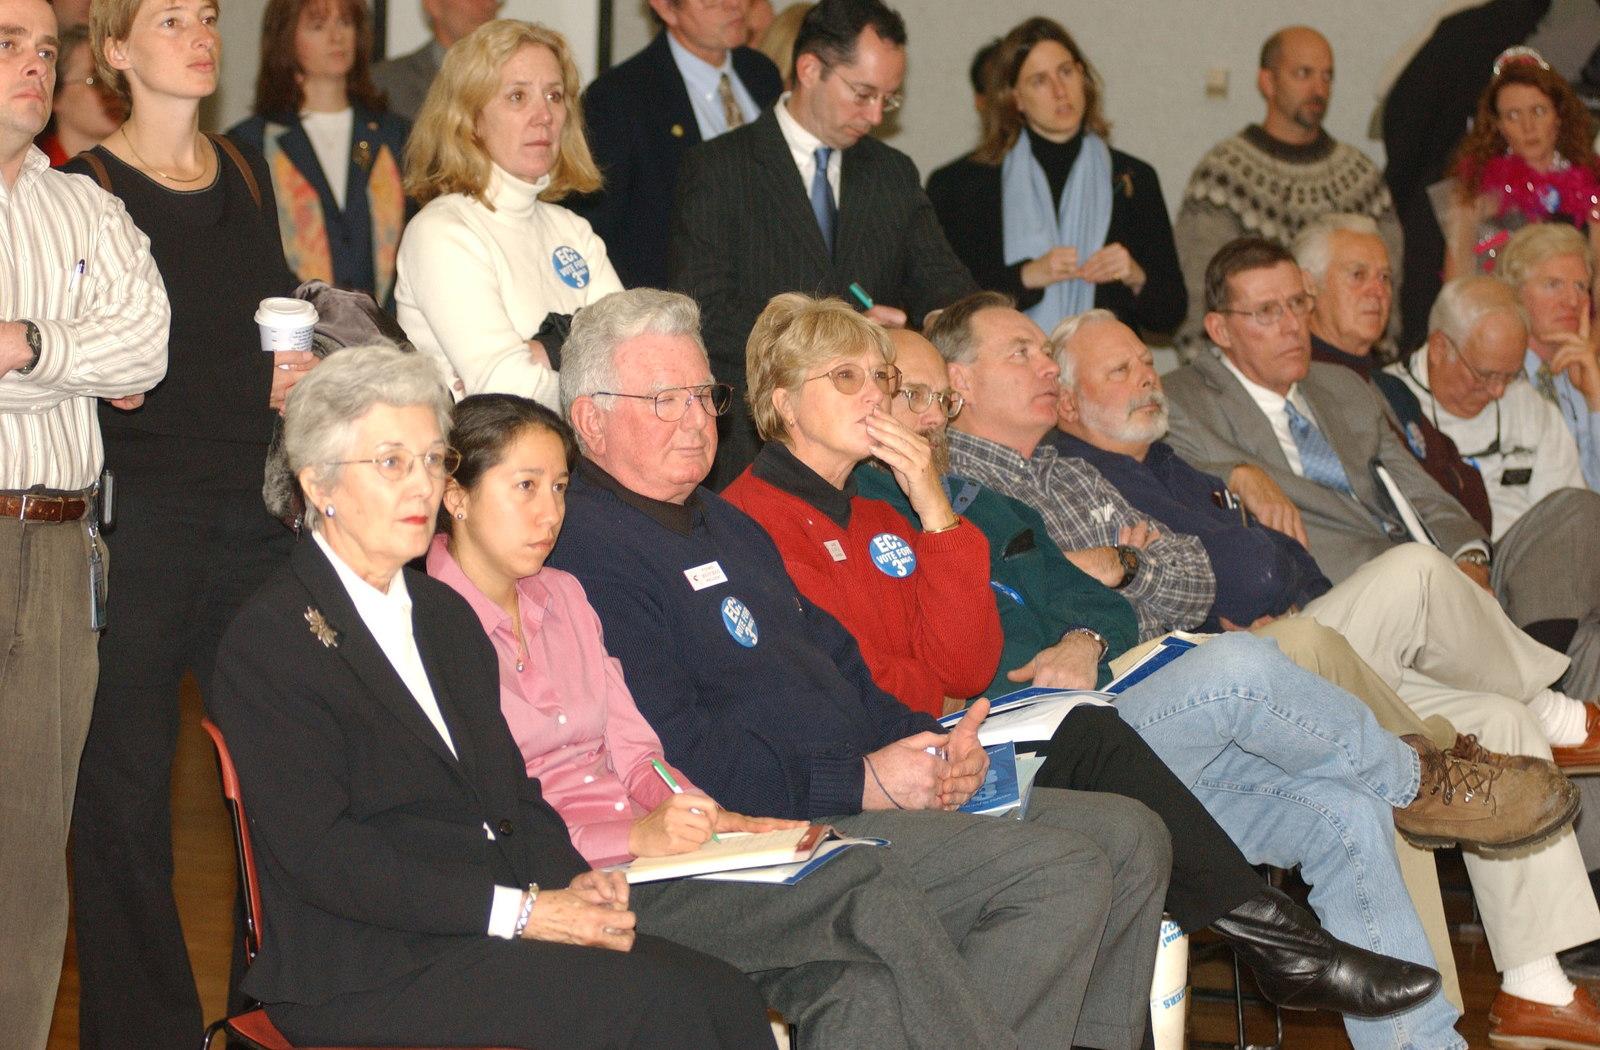 2003 Chesapeake Bay shoot - Executive Council meeting [412-APD-A167-IMAGE364.JPG]